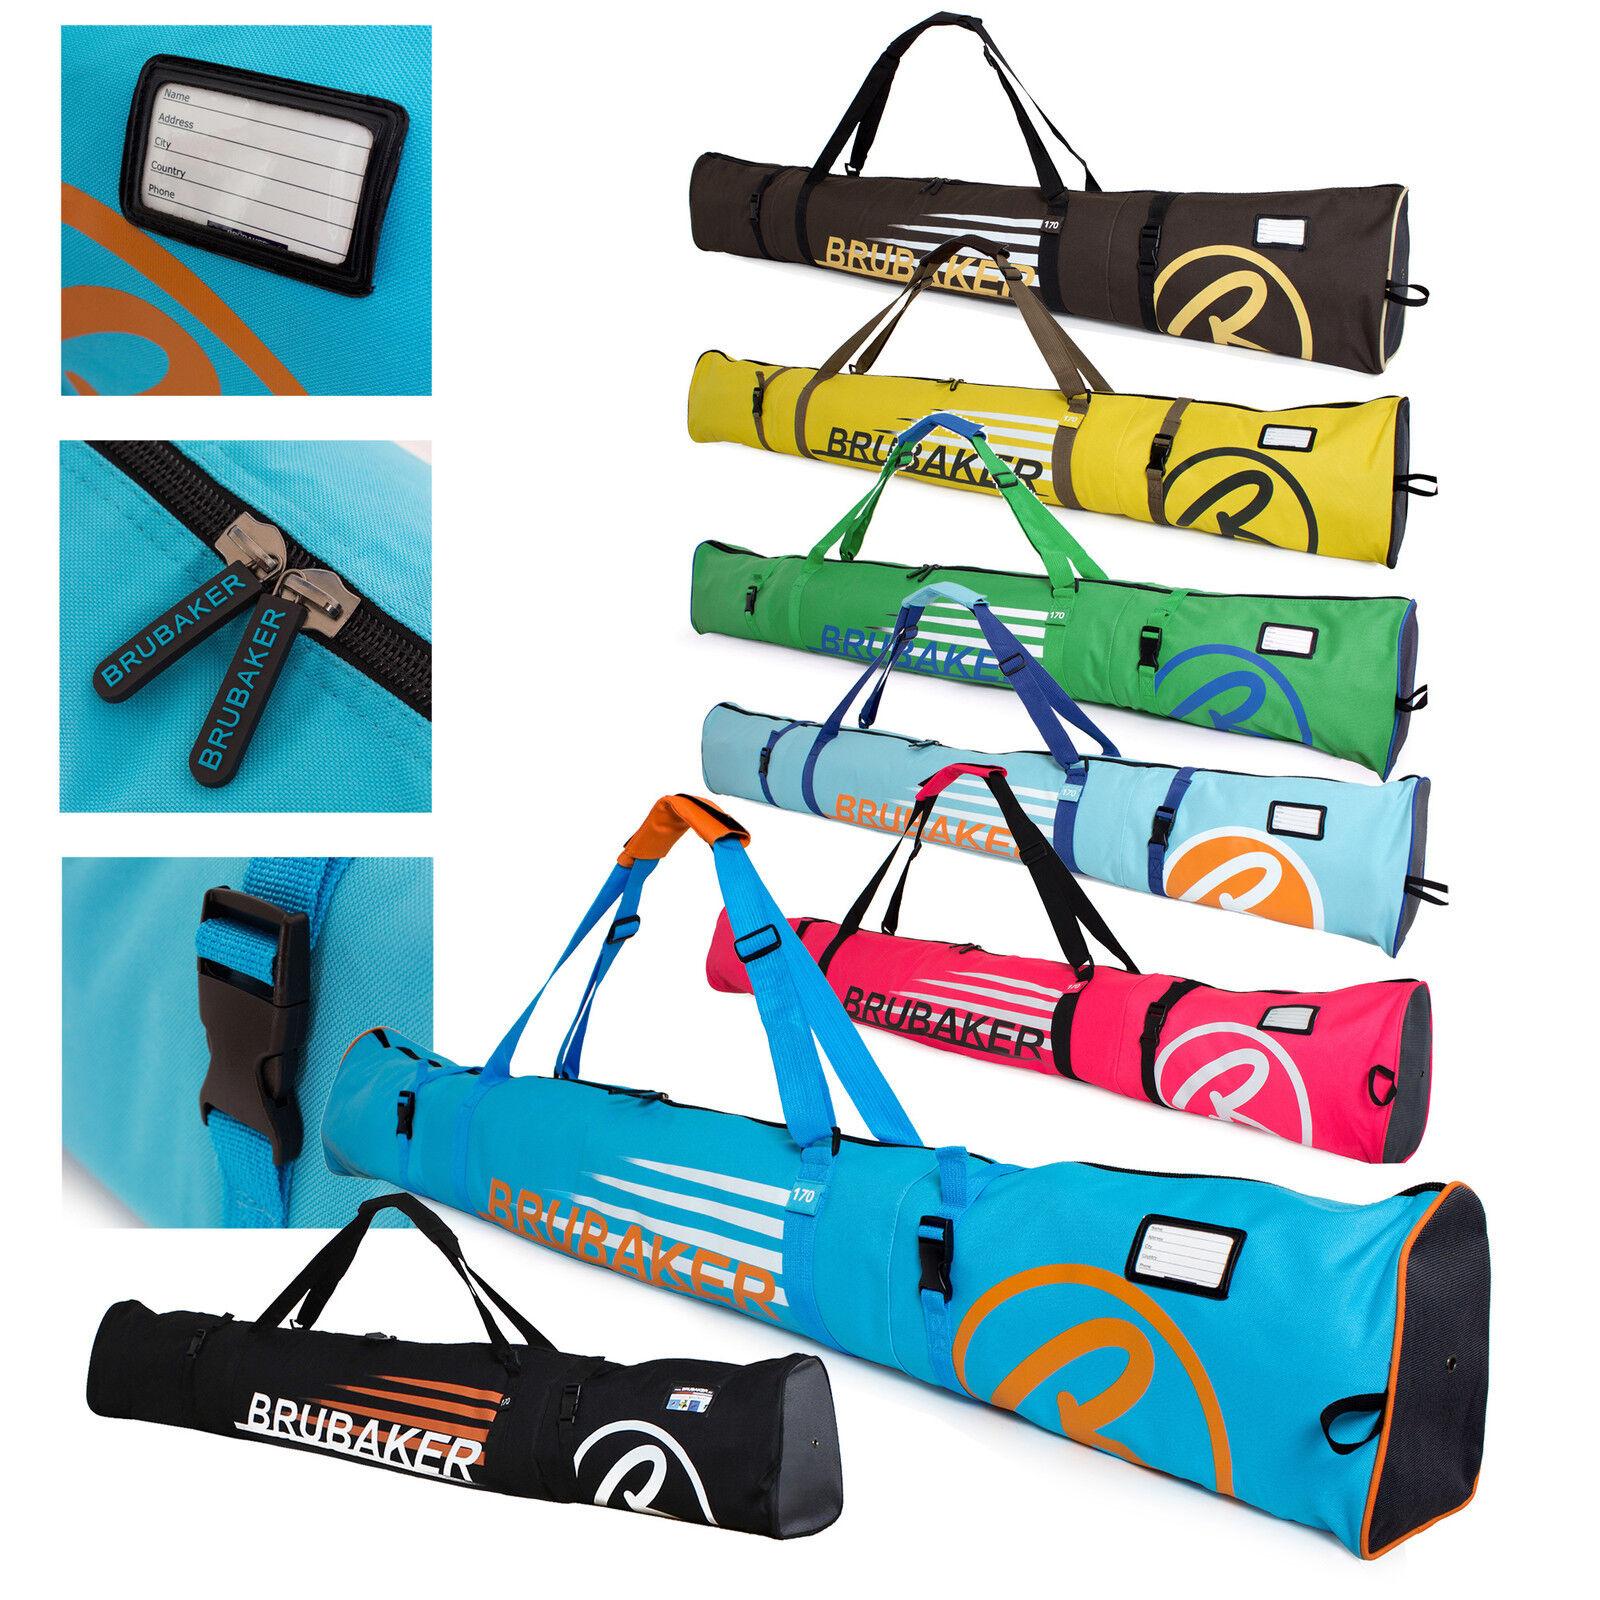 BRUBAKER 'Carver Champion 2.0' Skisack Skitasche Ski bag für 1 Paar Ski + Stöcke